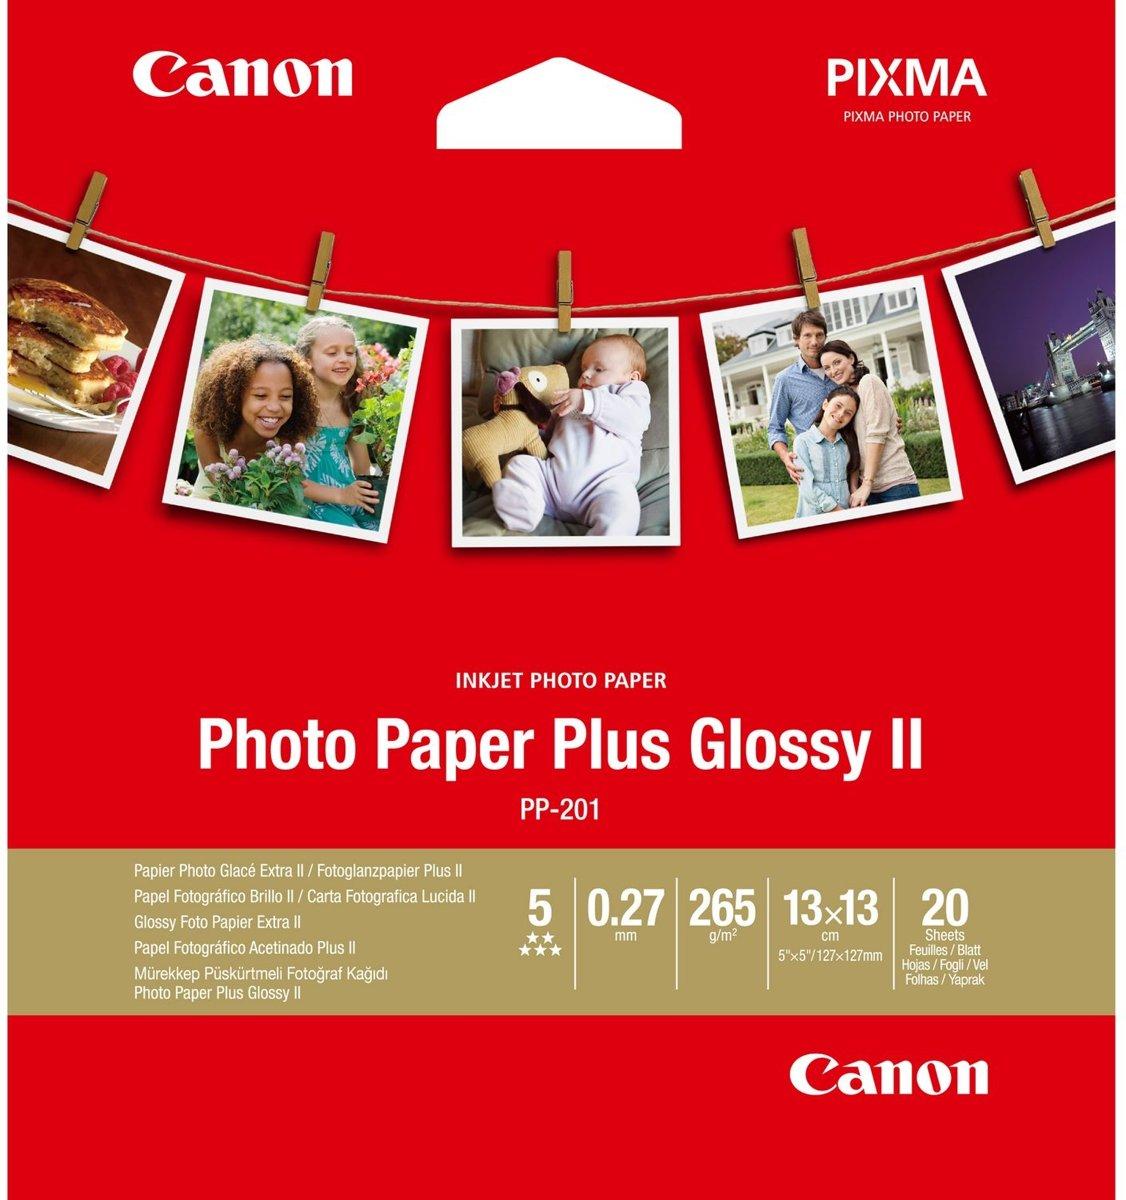 Bolcom Canon Plus Glossy Ii Wit Fotopapier 20 Vellen 13 X 13 Cm